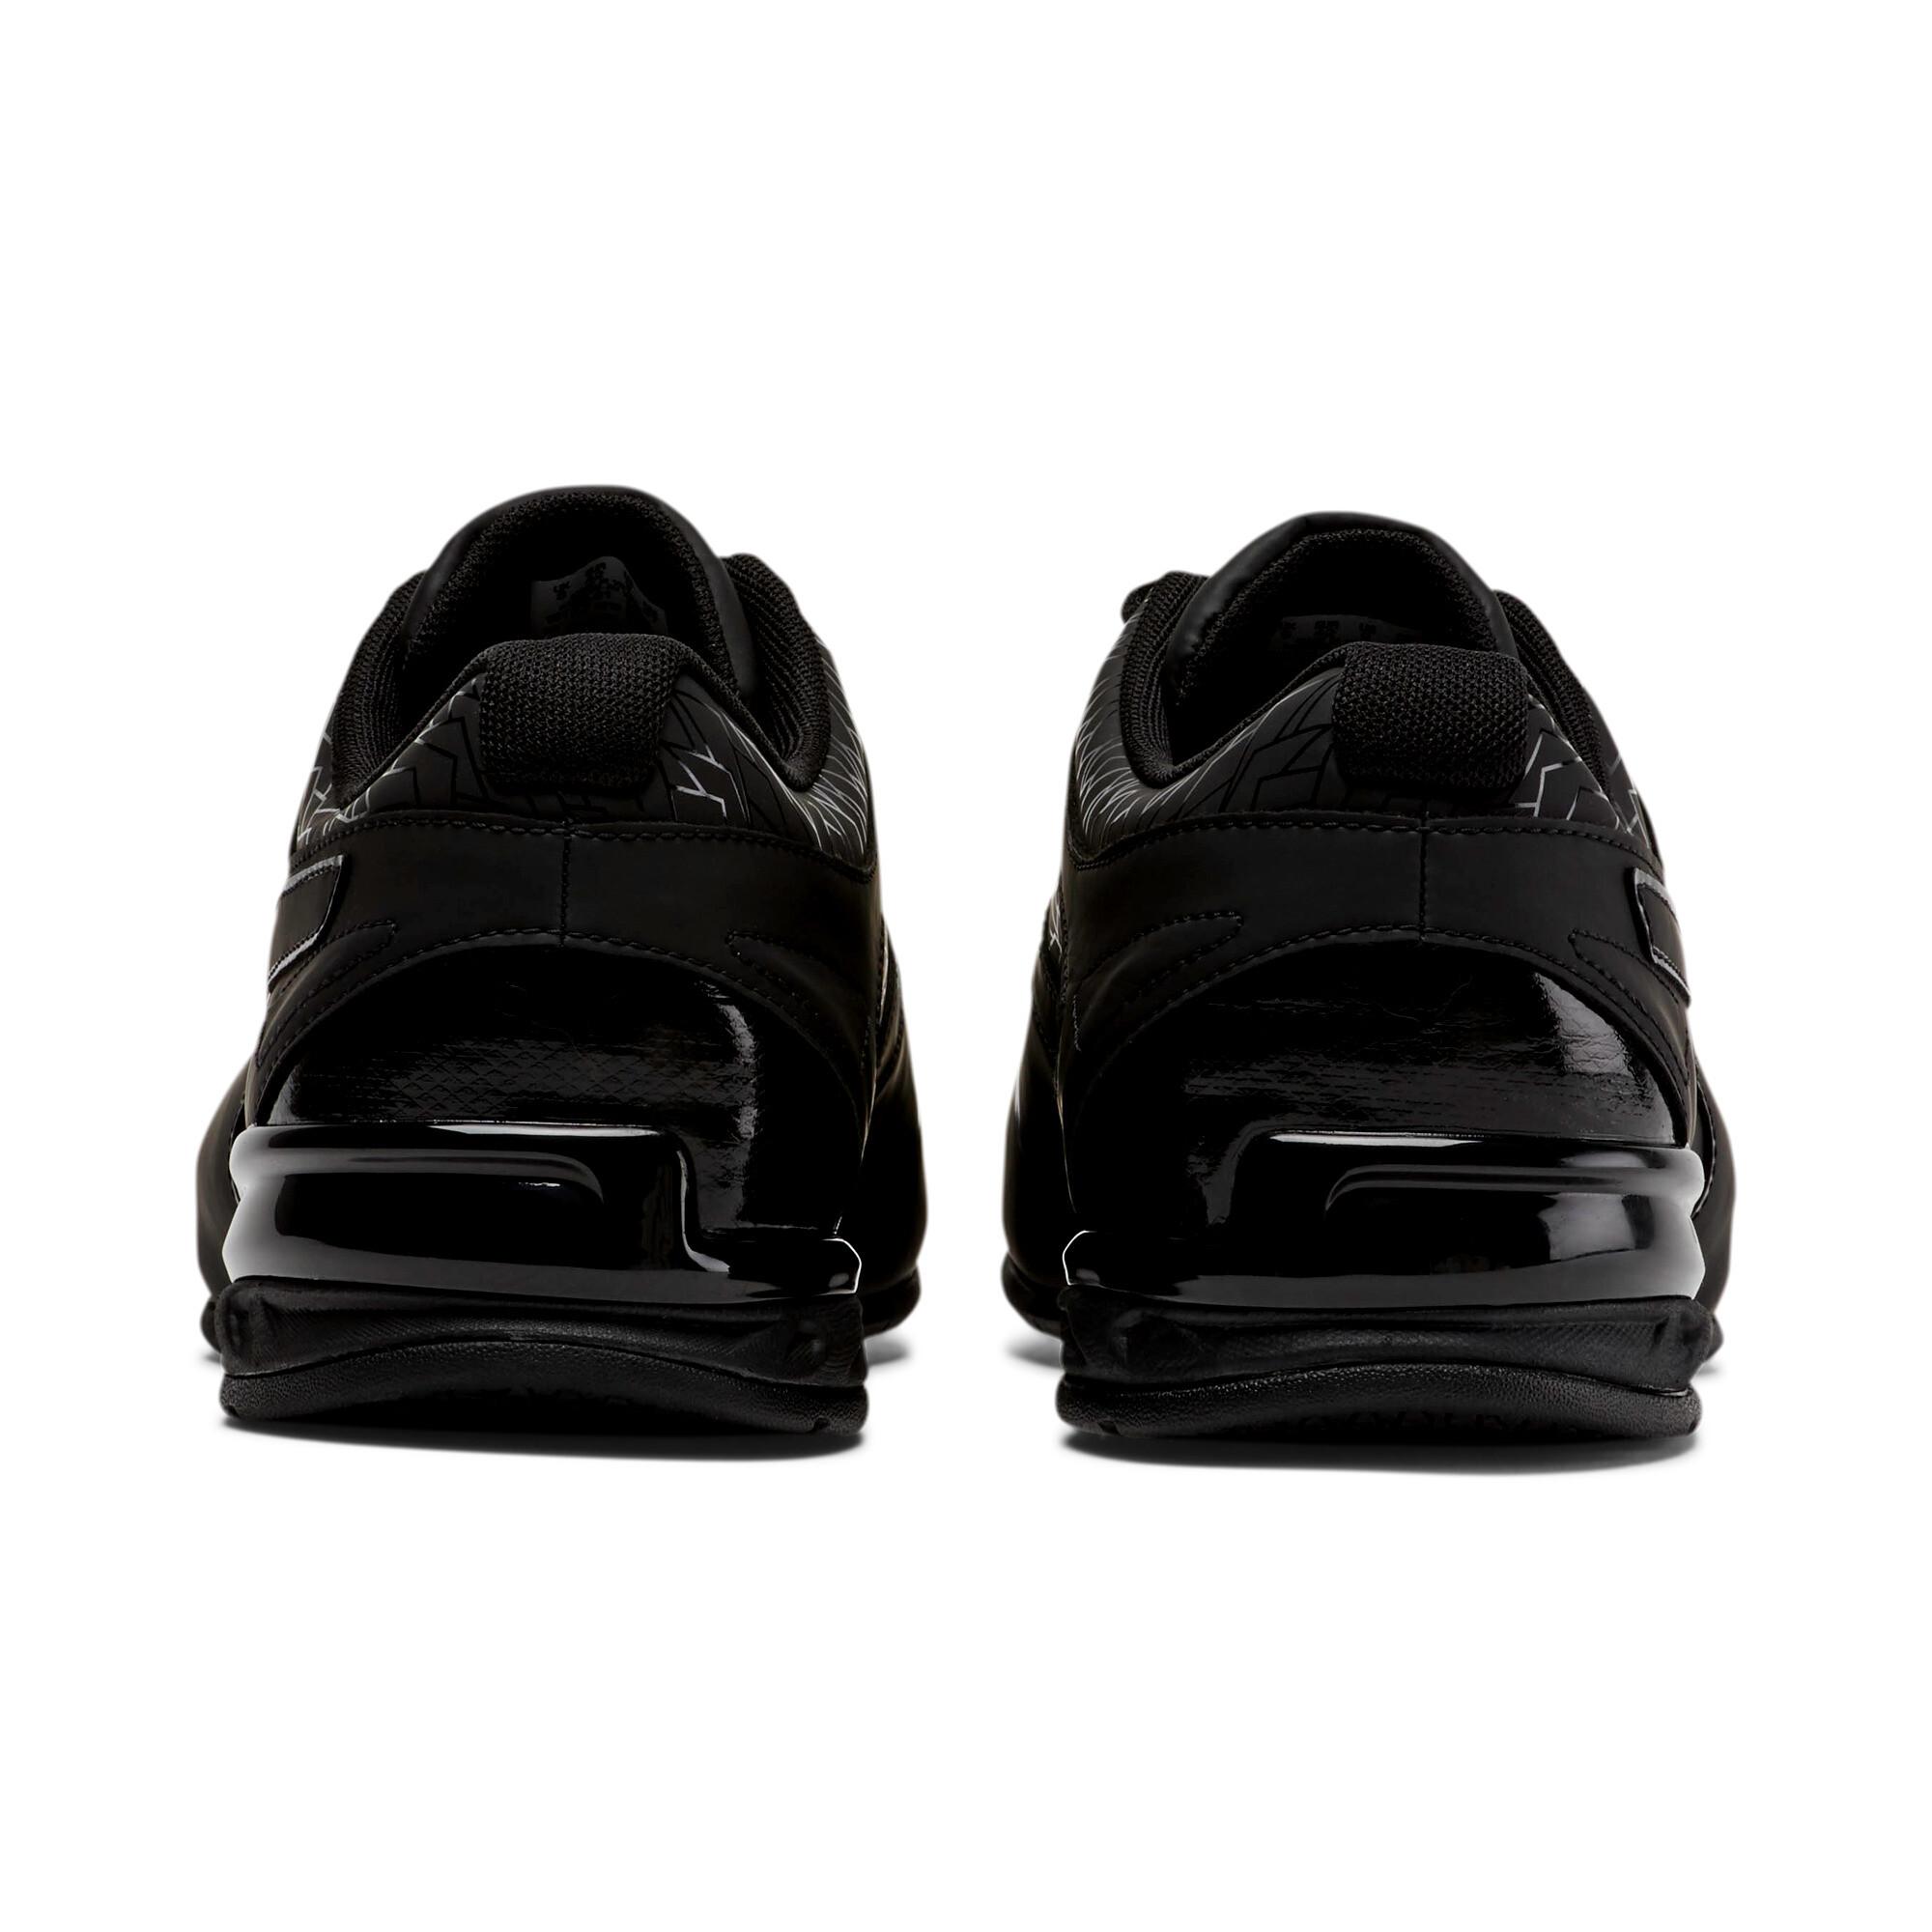 PUMA-Men-039-s-Tazon-6-Fracture-FM-Wide-Sneakers miniatura 8